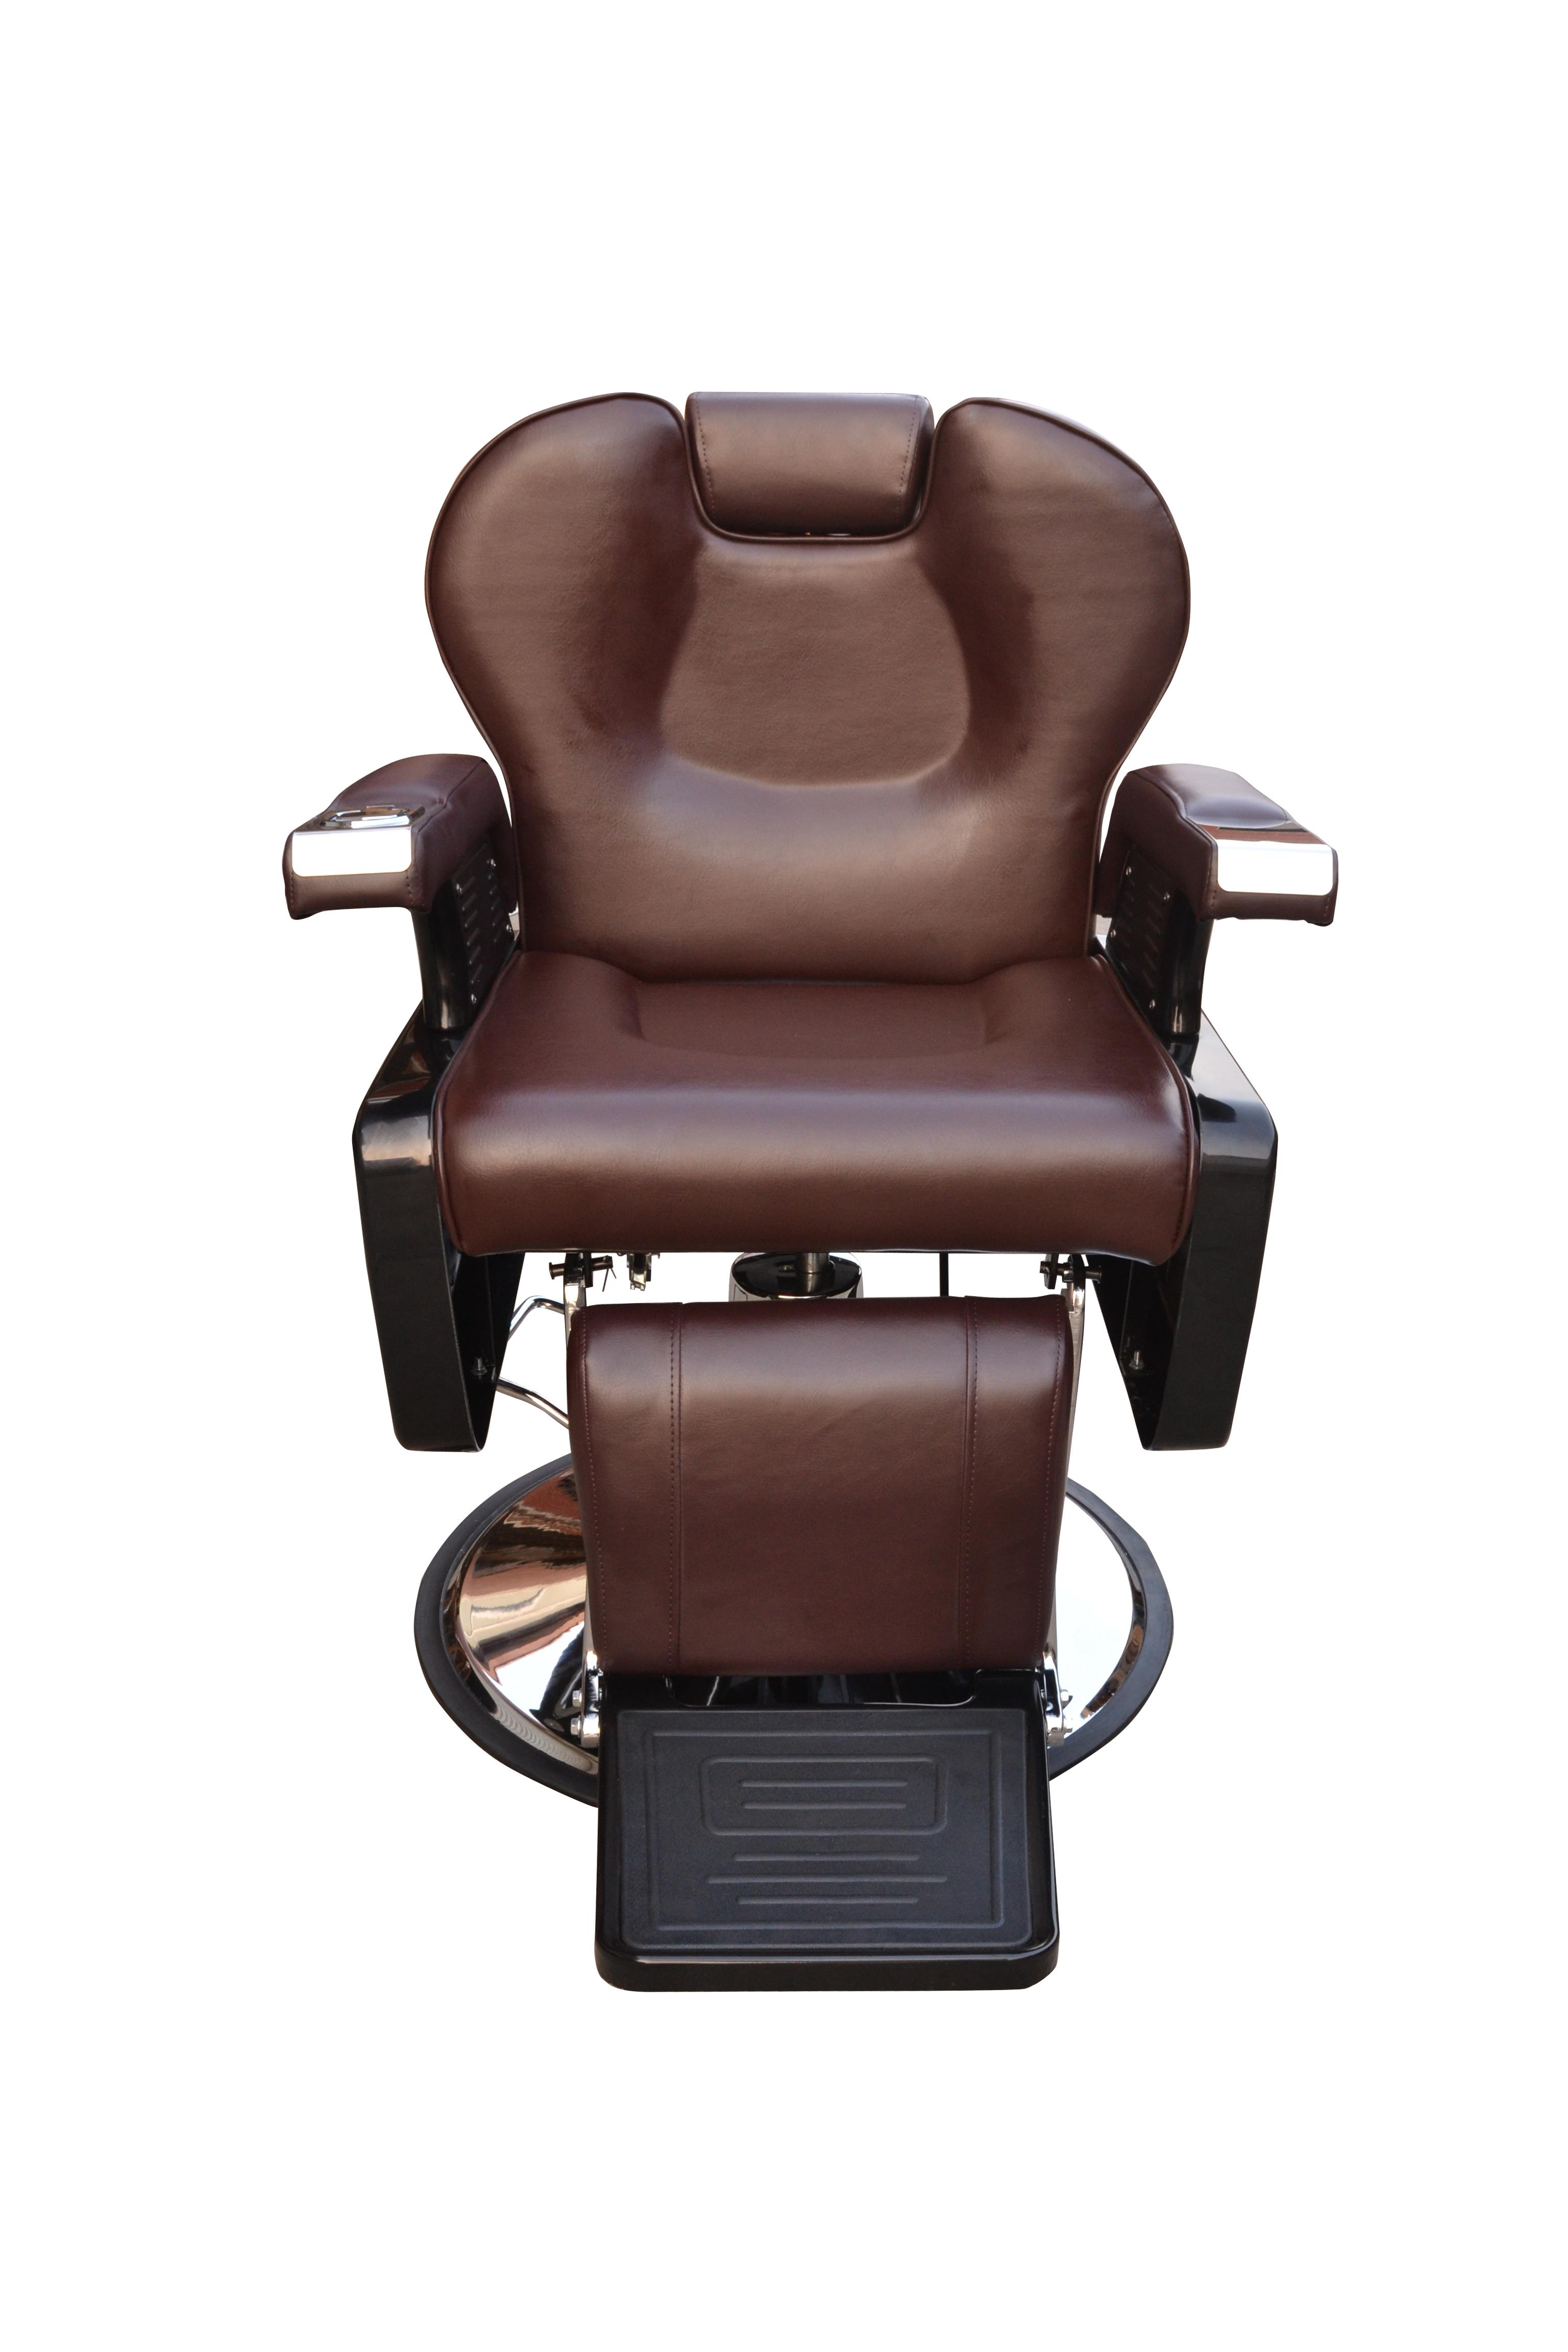 BarberPub All Purpose Hydraulic Recline Barber Chair Salon Beauty Spa 8702 Brown 12